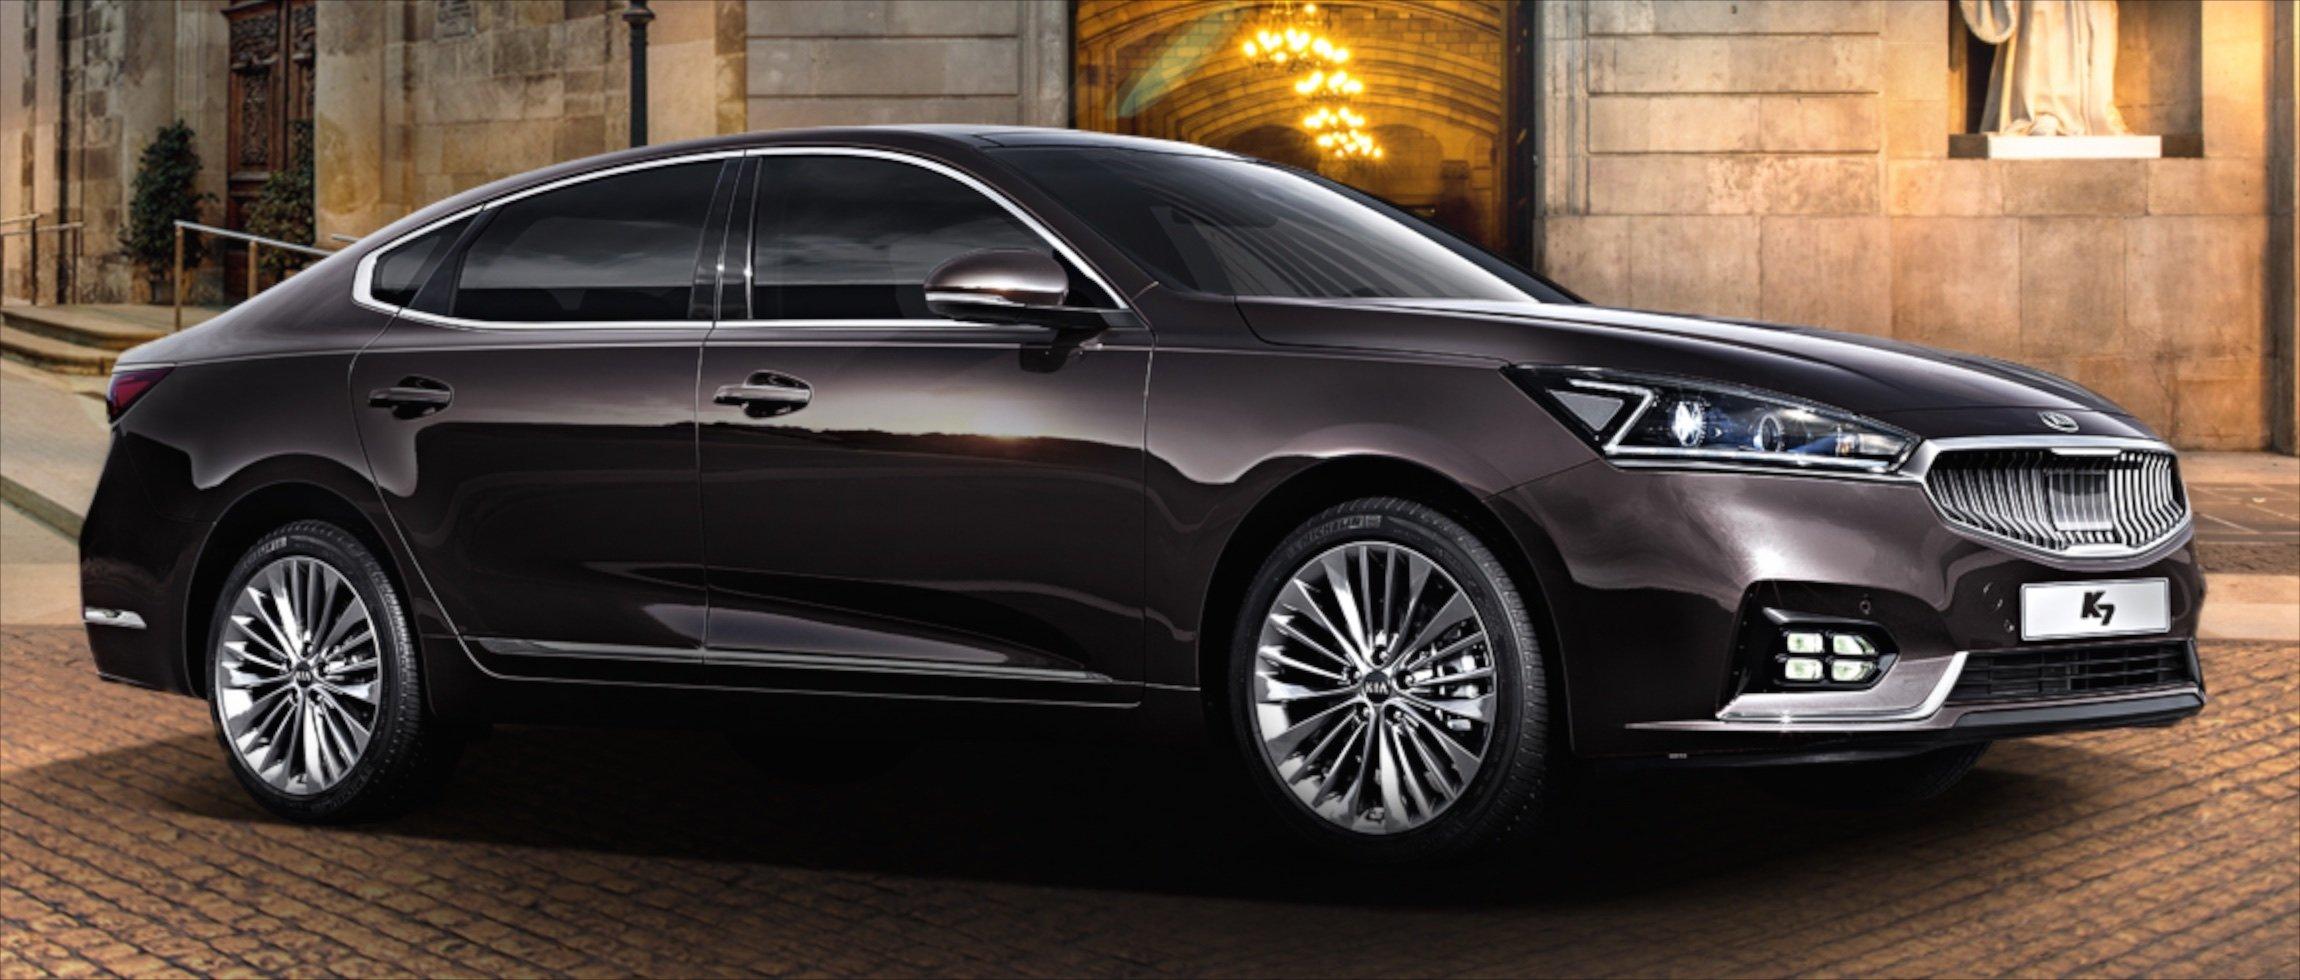 K Loan For New Car